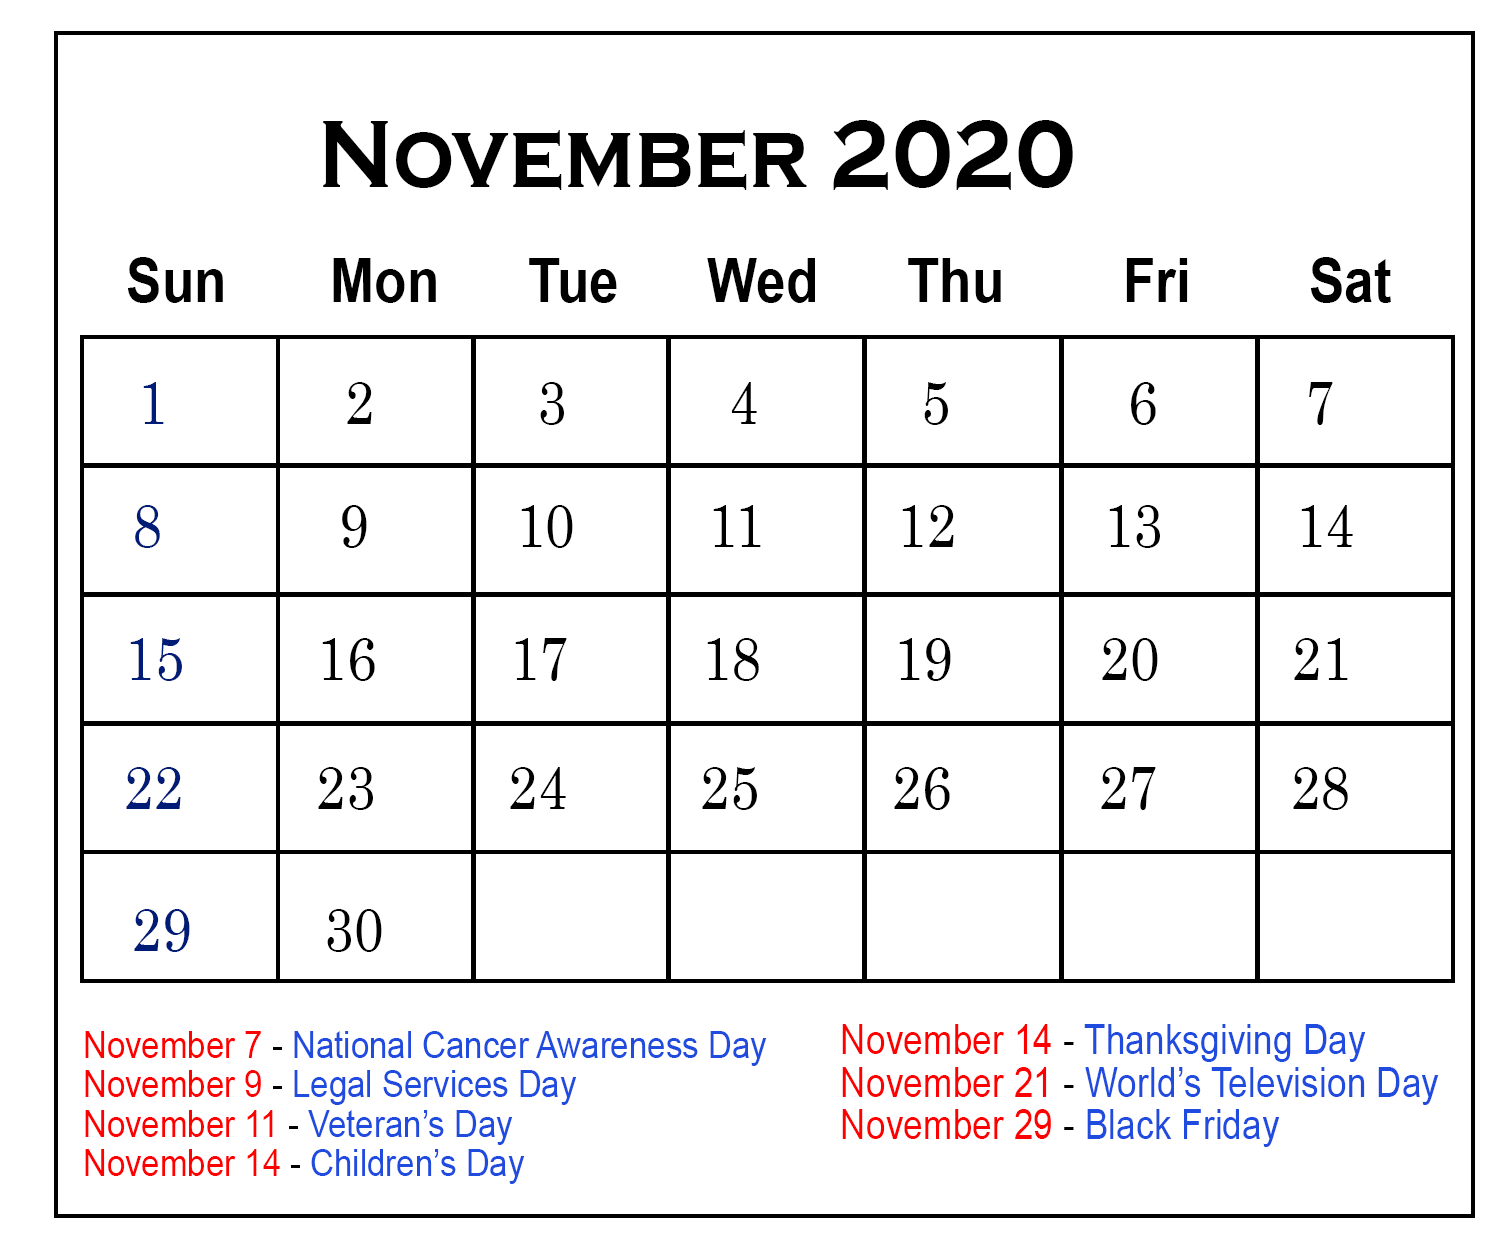 November 2020 Calendar with Holidays